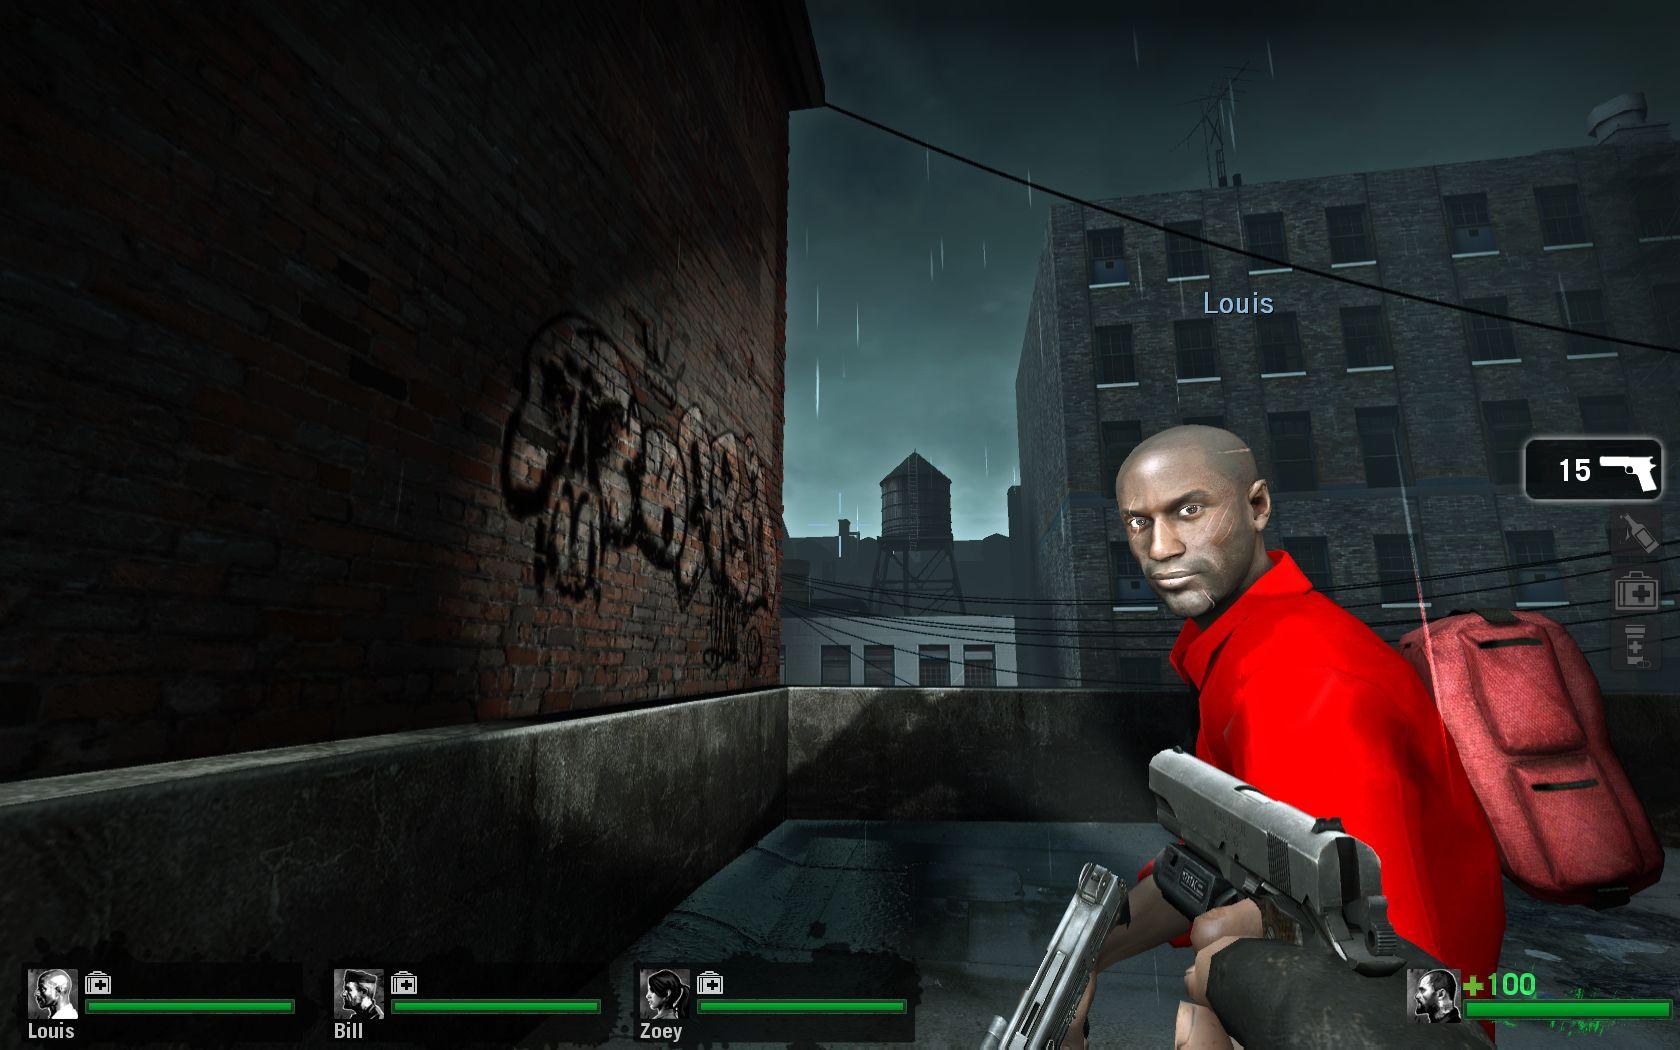 http://games.softpedia.com/screenshots/Left-4-Dead-Skin-Scarface_2.jpg